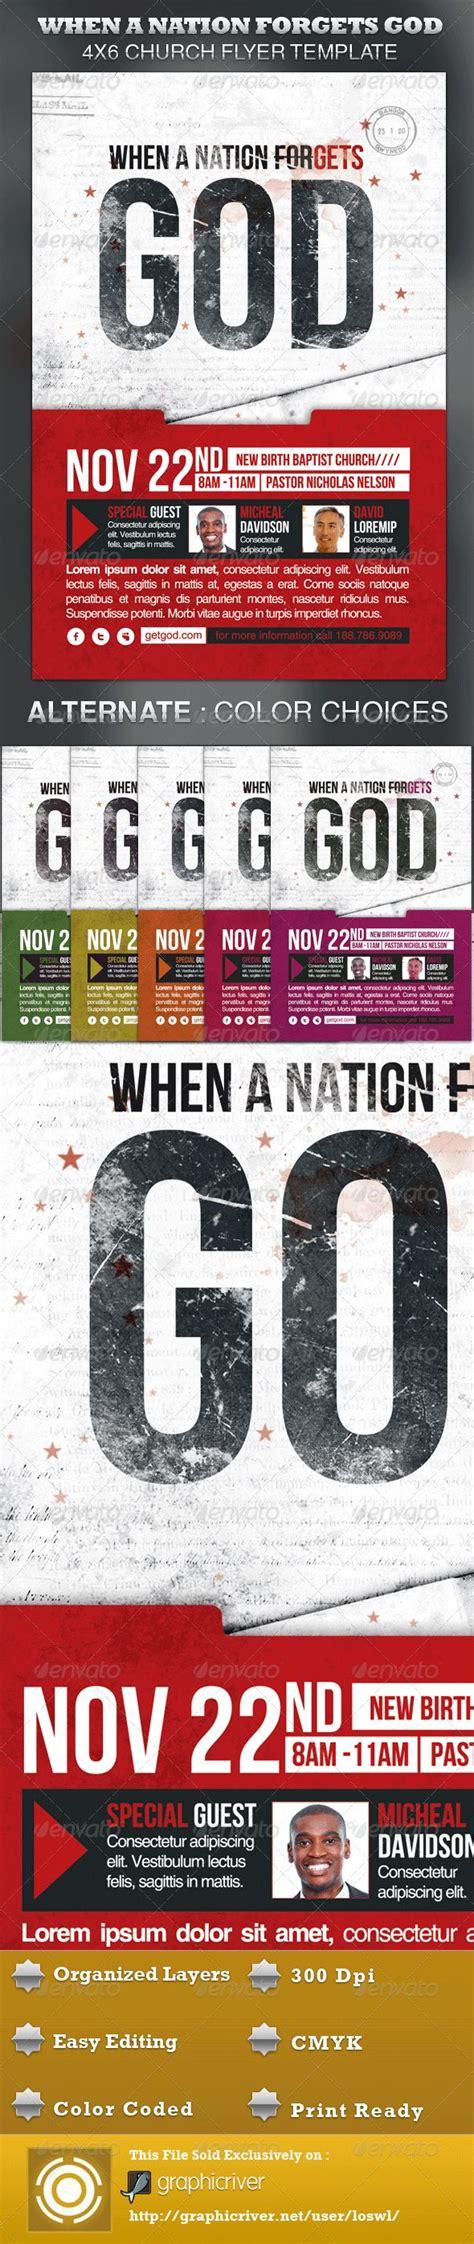 flyer design music 27 best flyers images on pinterest